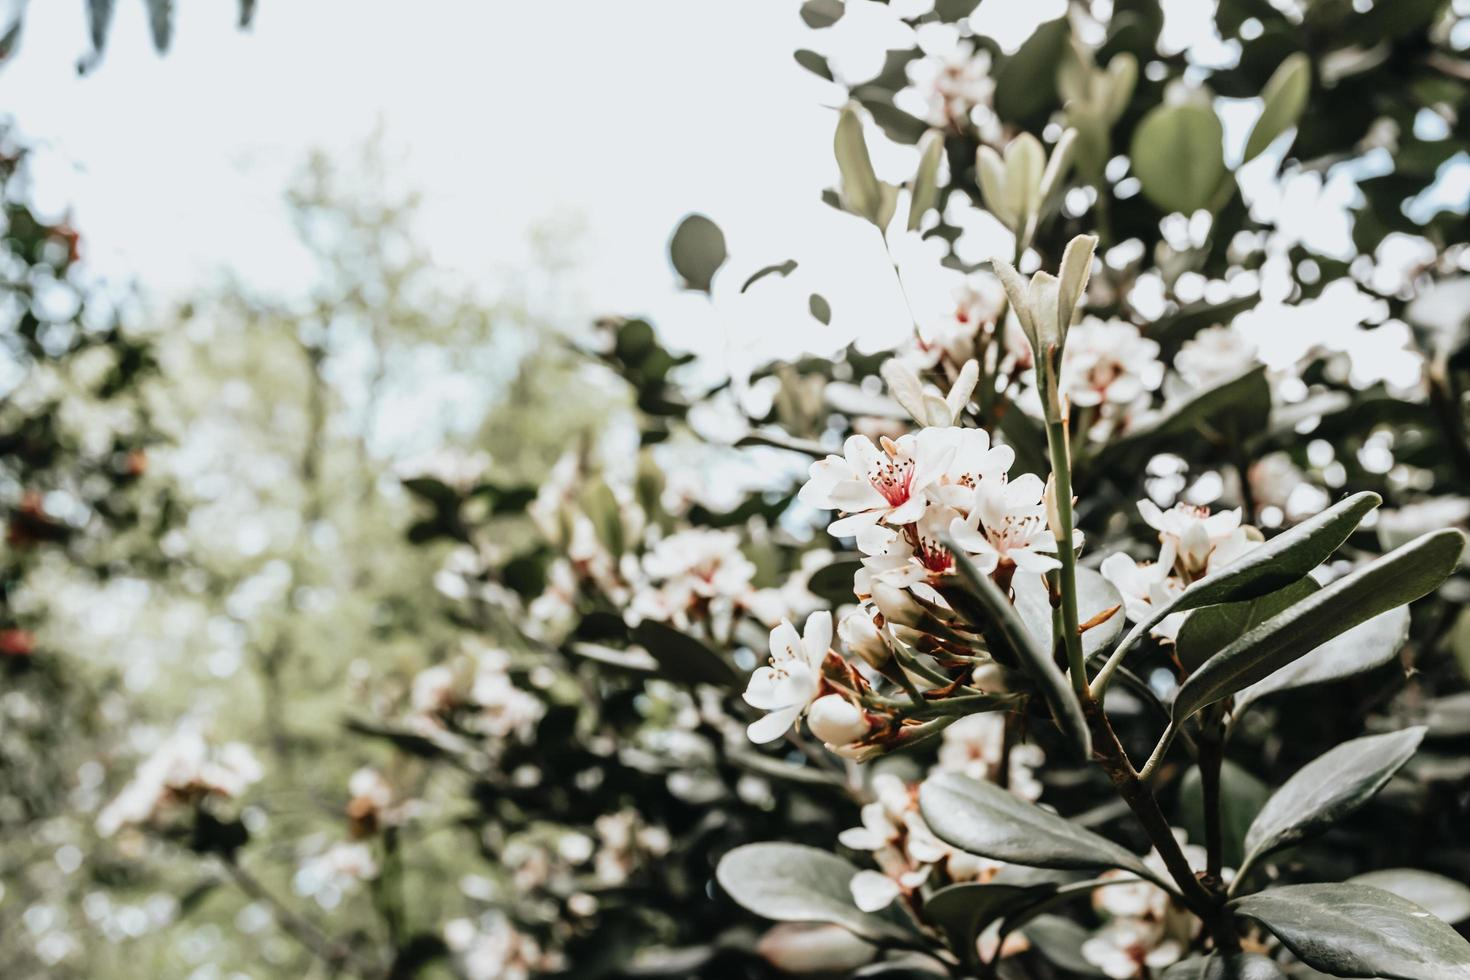 en vit blomma som blommar under en ljus dag foto